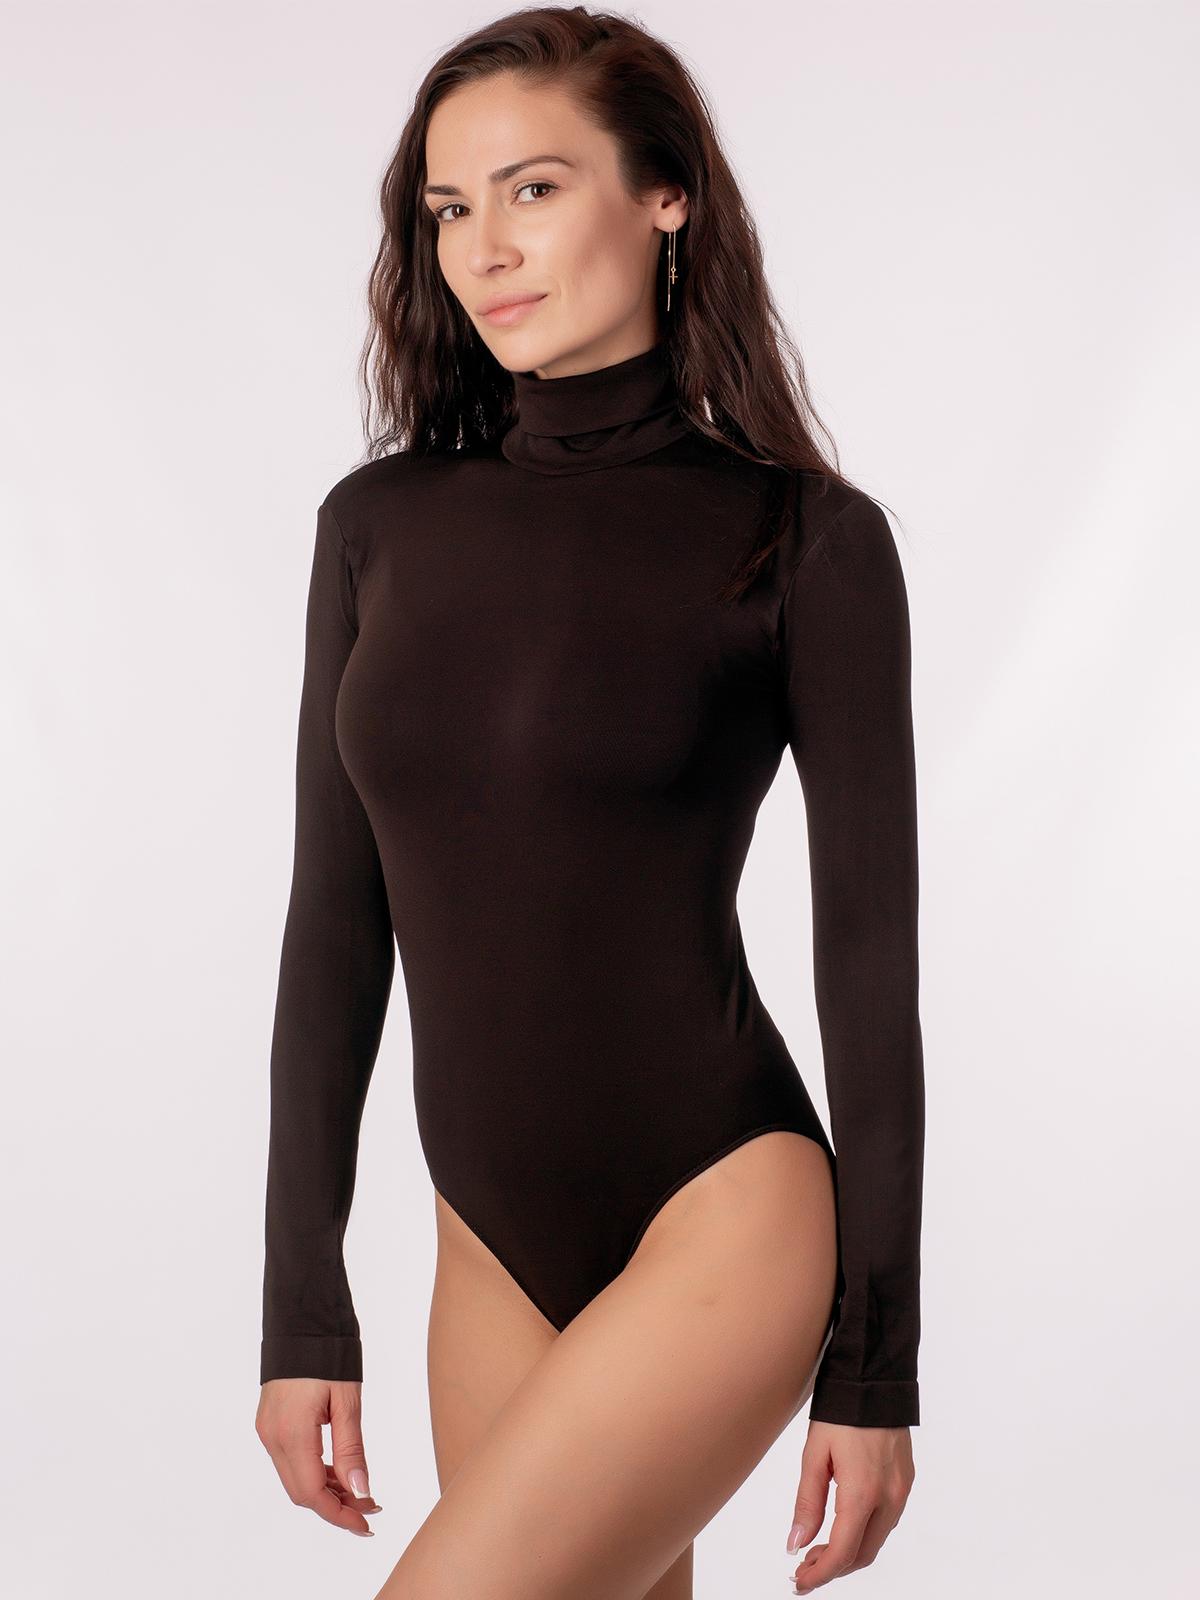 Боди женское Giulia BODY DOLCEVITA MANICA LUNGA коричневое S/M